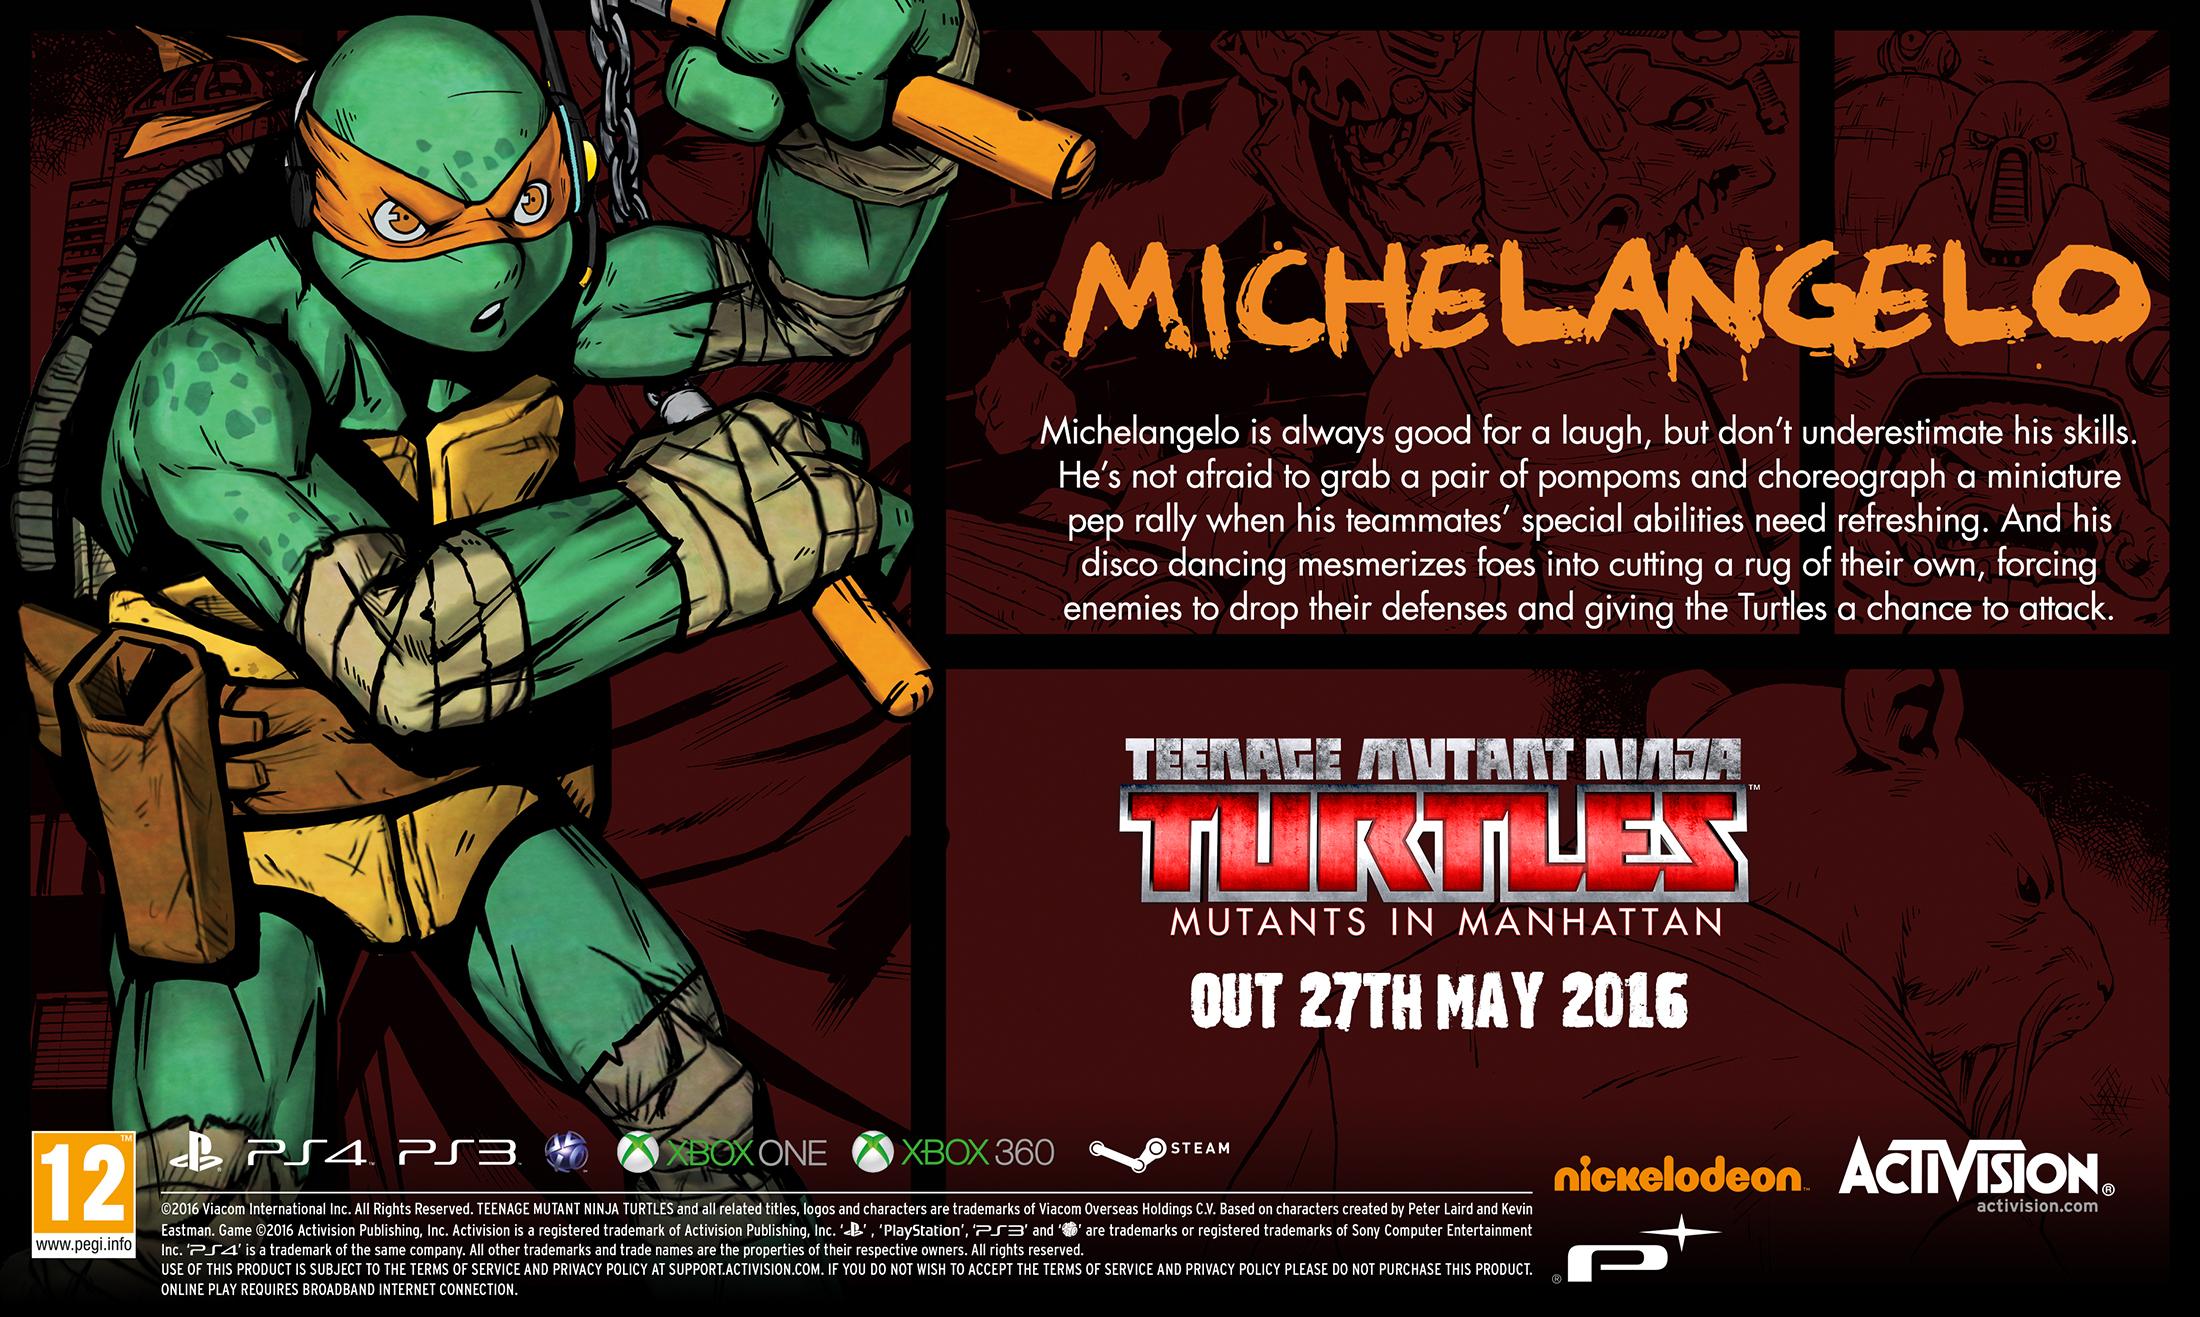 Трейлеры героев TMNT: Mutants in Manhattan